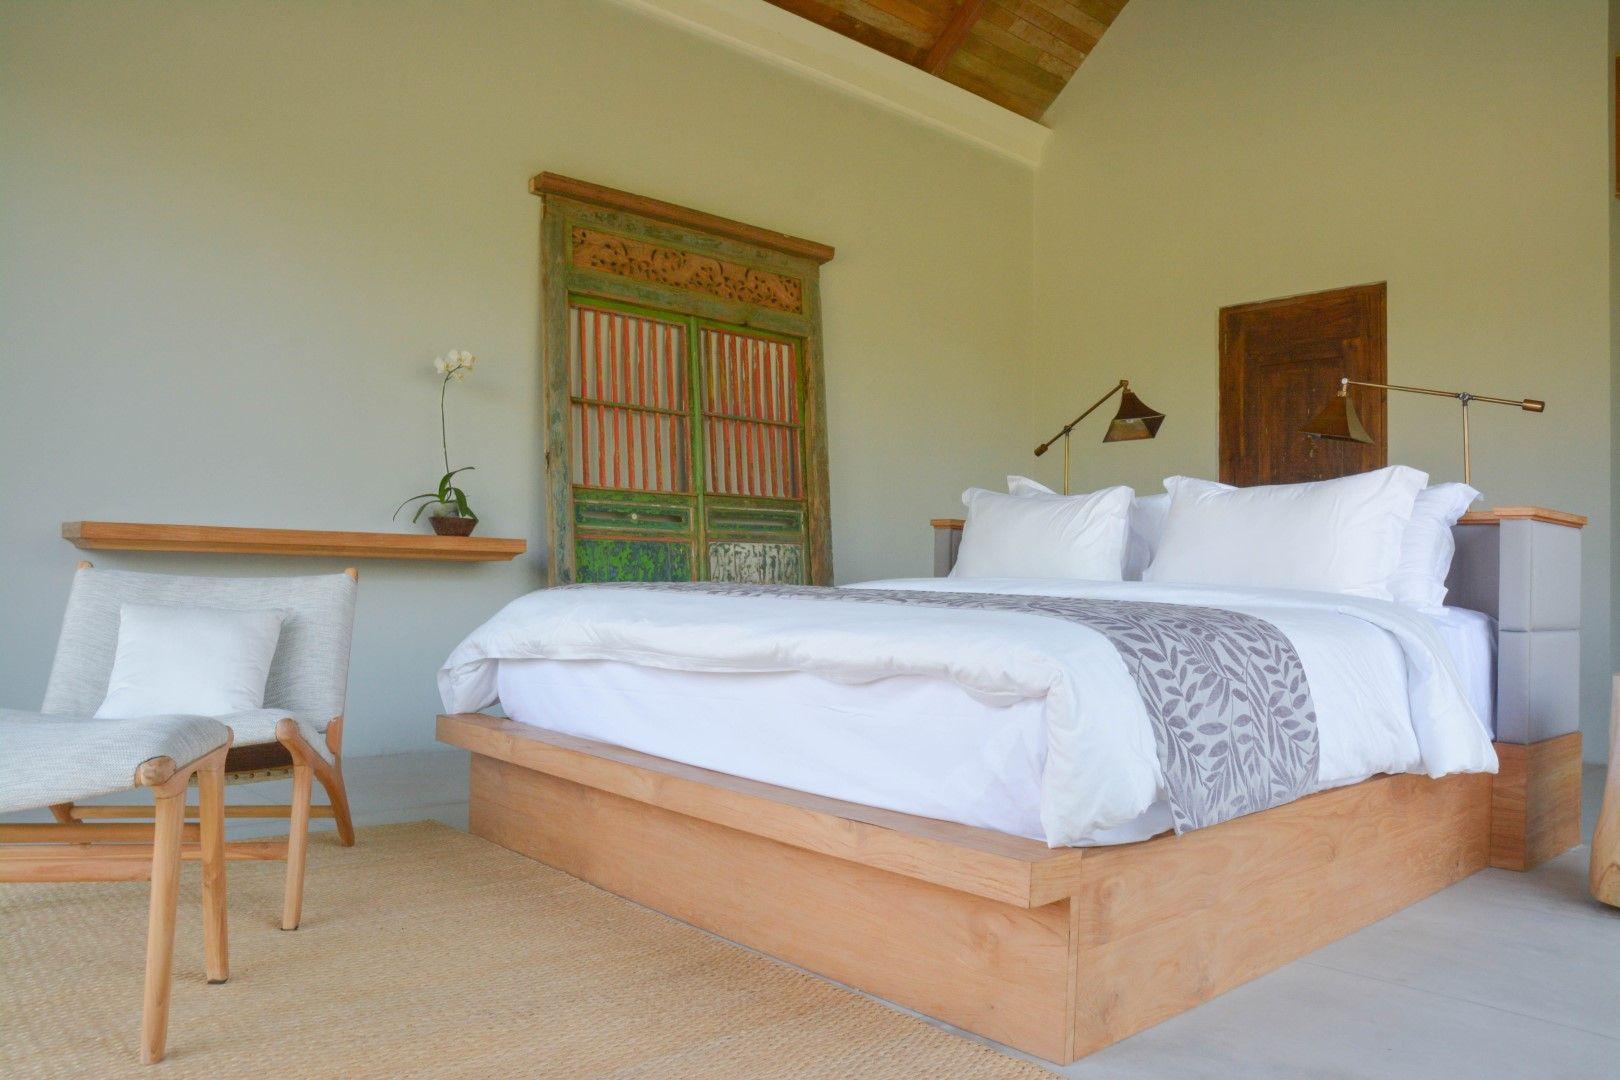 Jacuzzi in master bedroom  Villa Lumia Bali  Master Bedroom llalumiabali  Villa